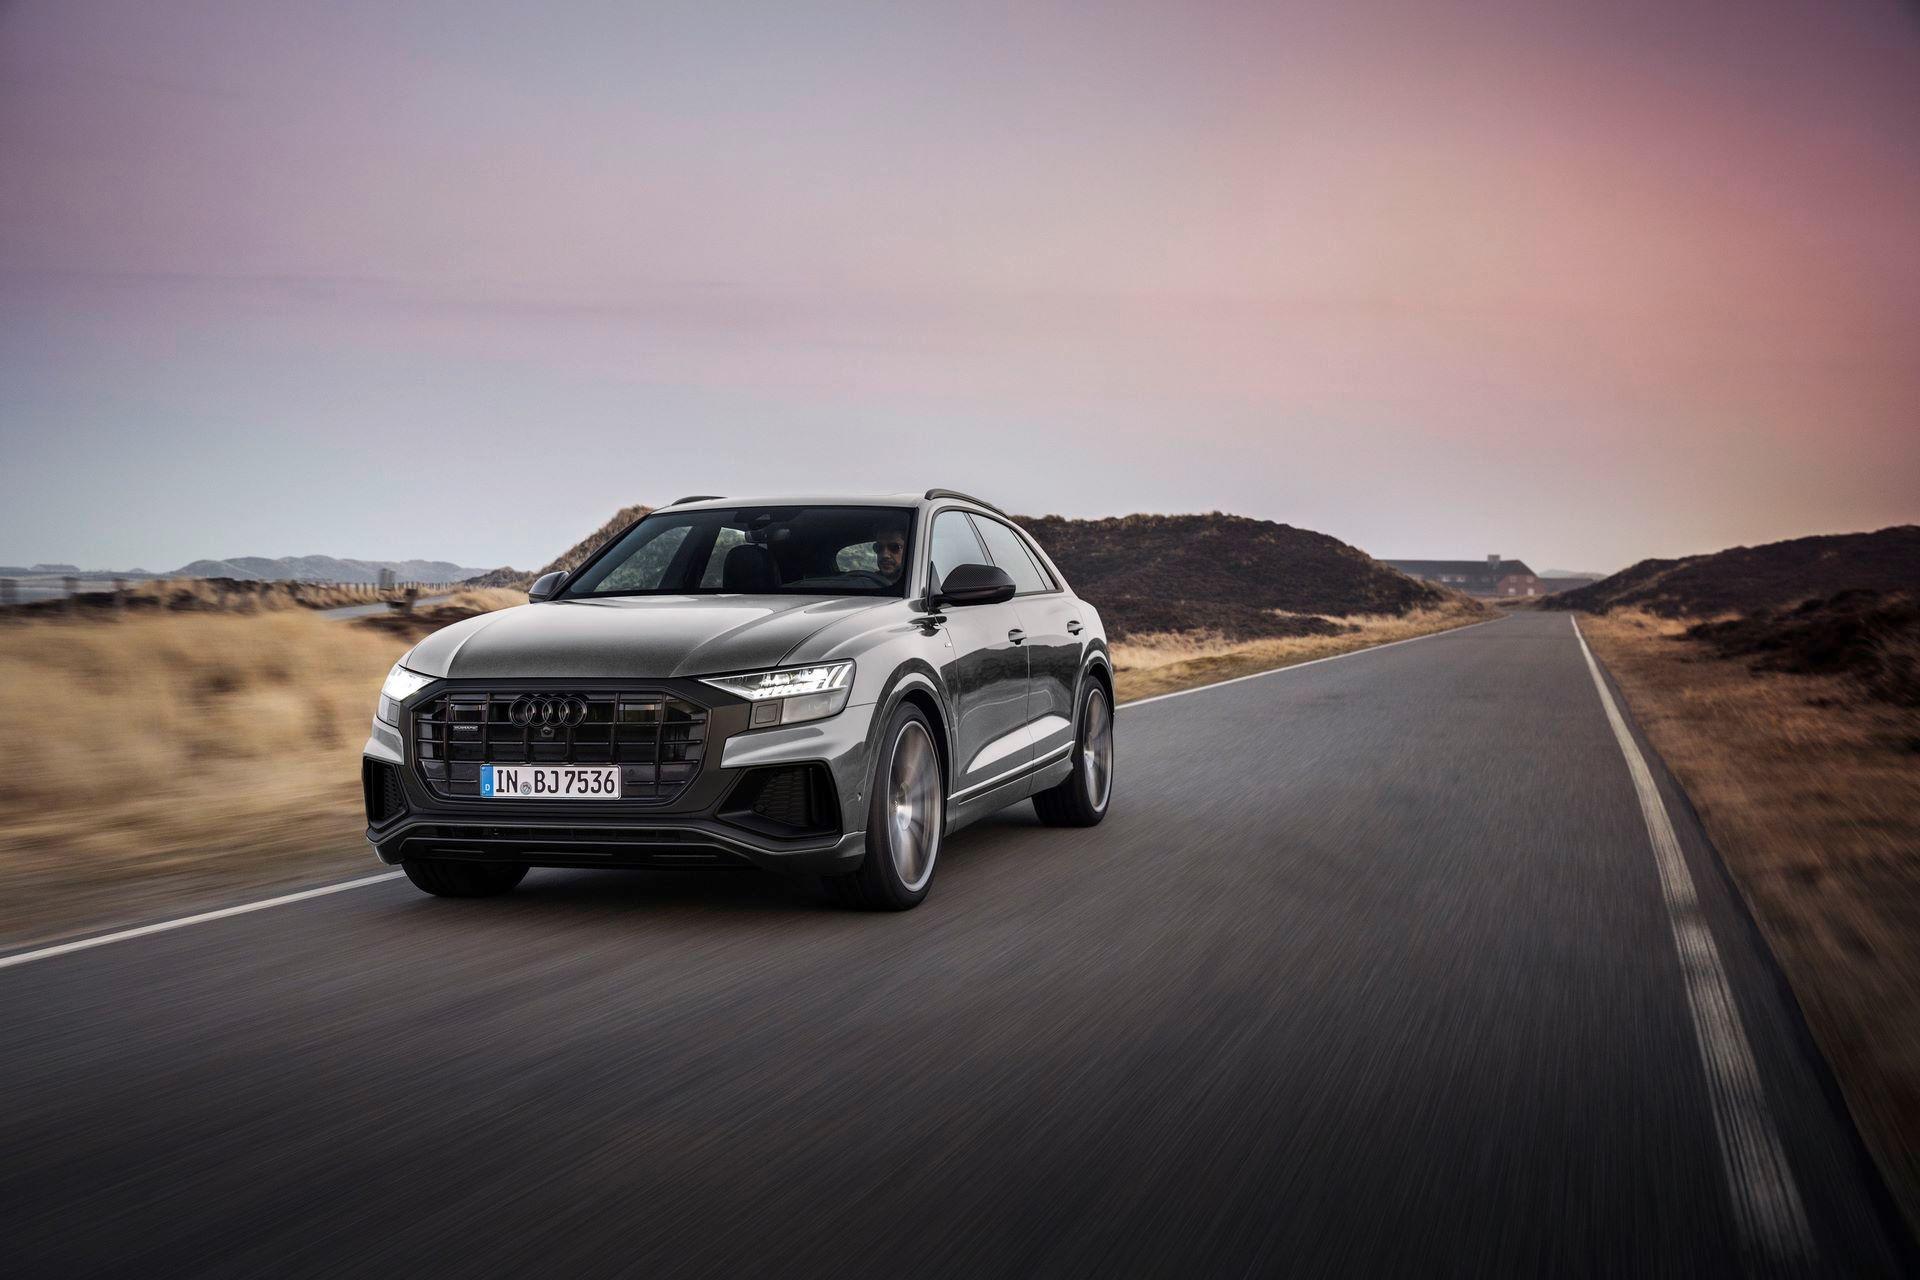 Audi-A4-A5-Q7-Q8-Competition-And-Competition-Plus-Trims-27